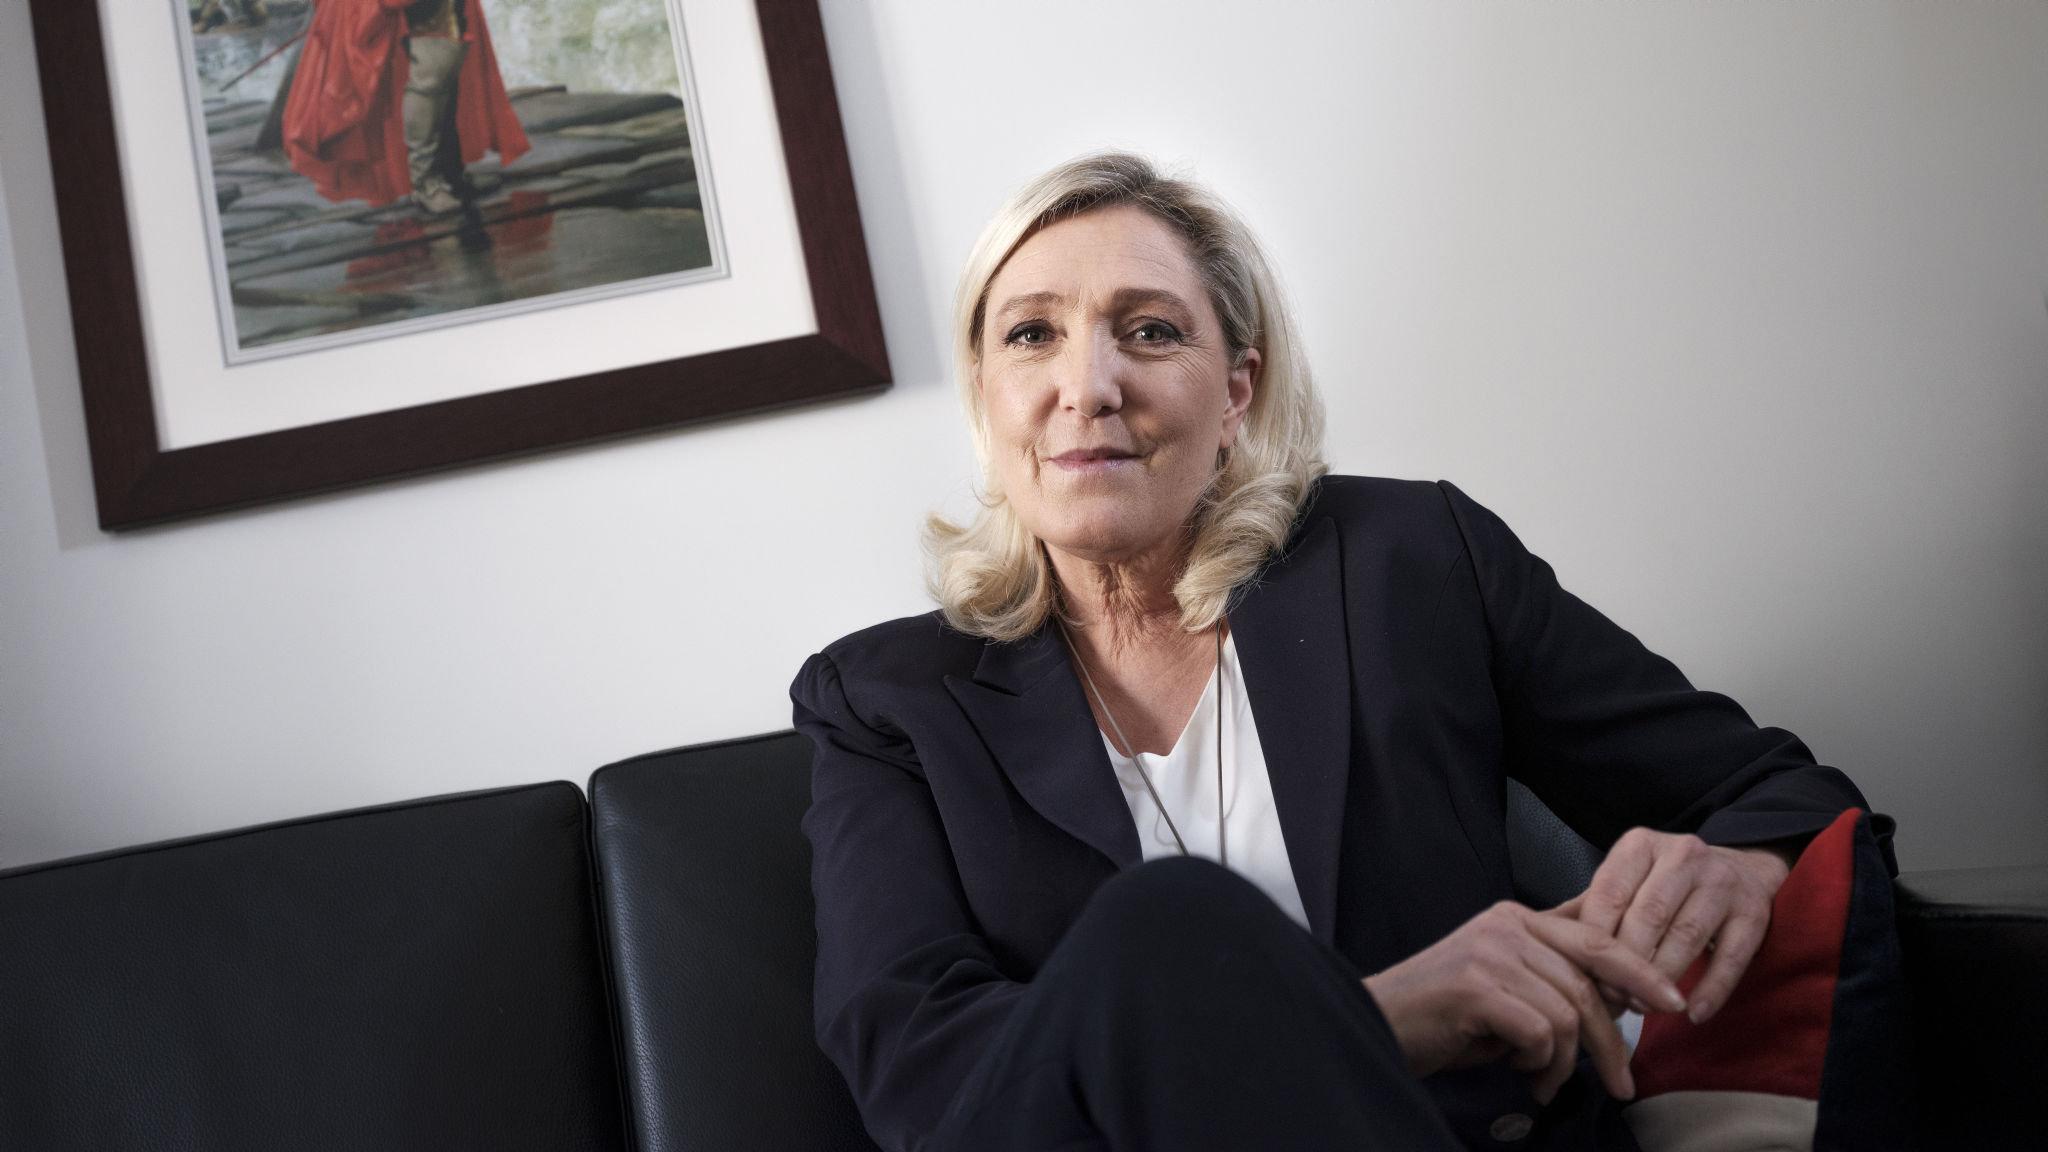 Resurgent Marine Le Pen revels in Macron's woes